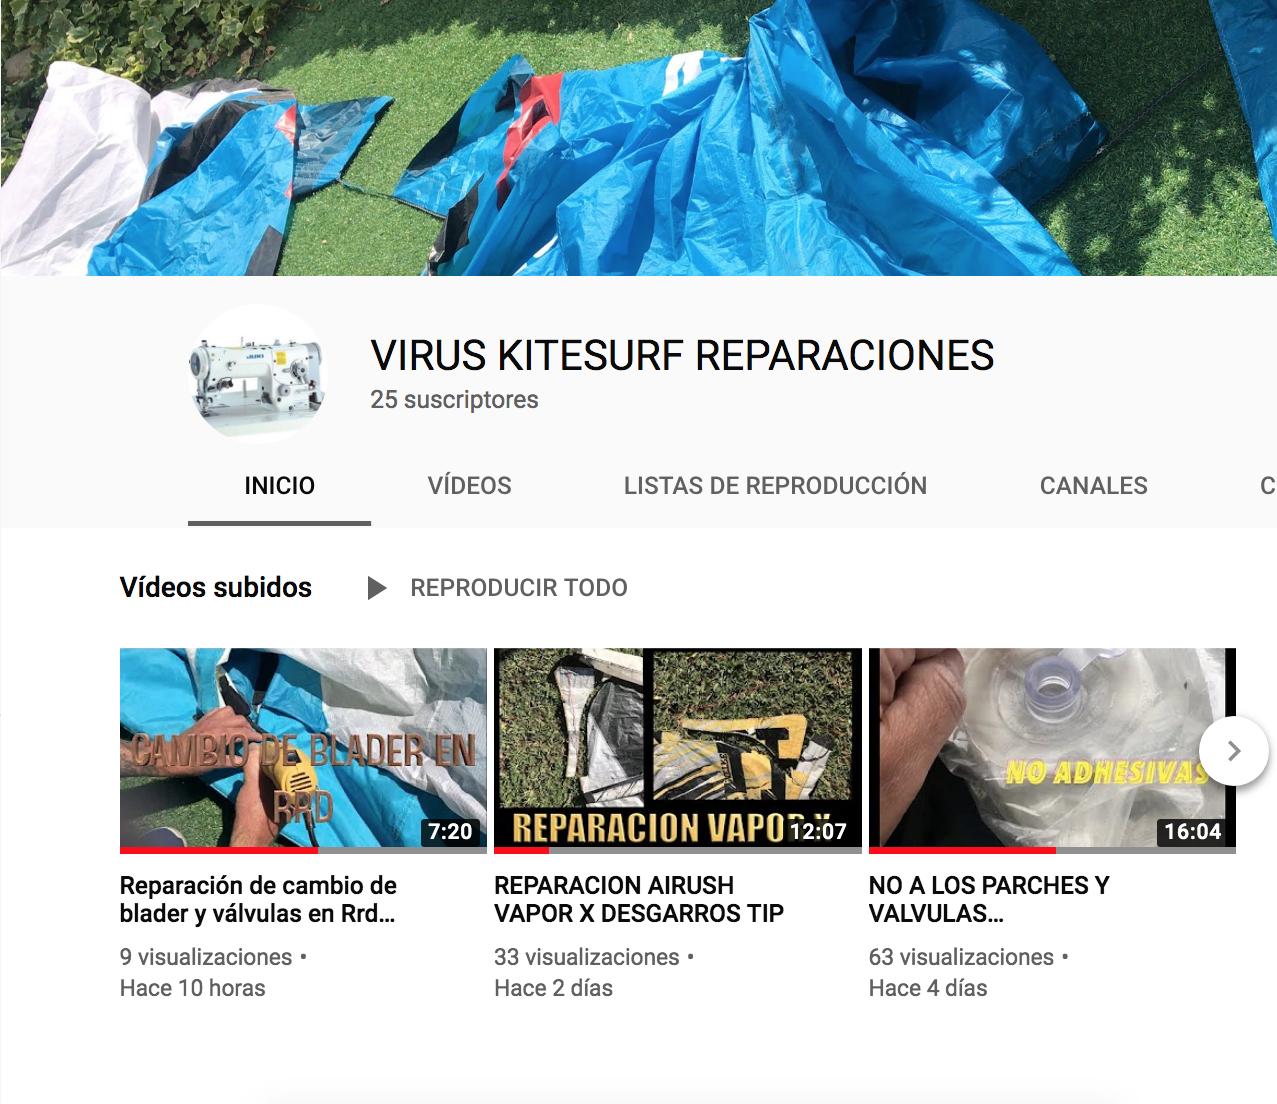 VIRUS KITESURF REPARACIONES